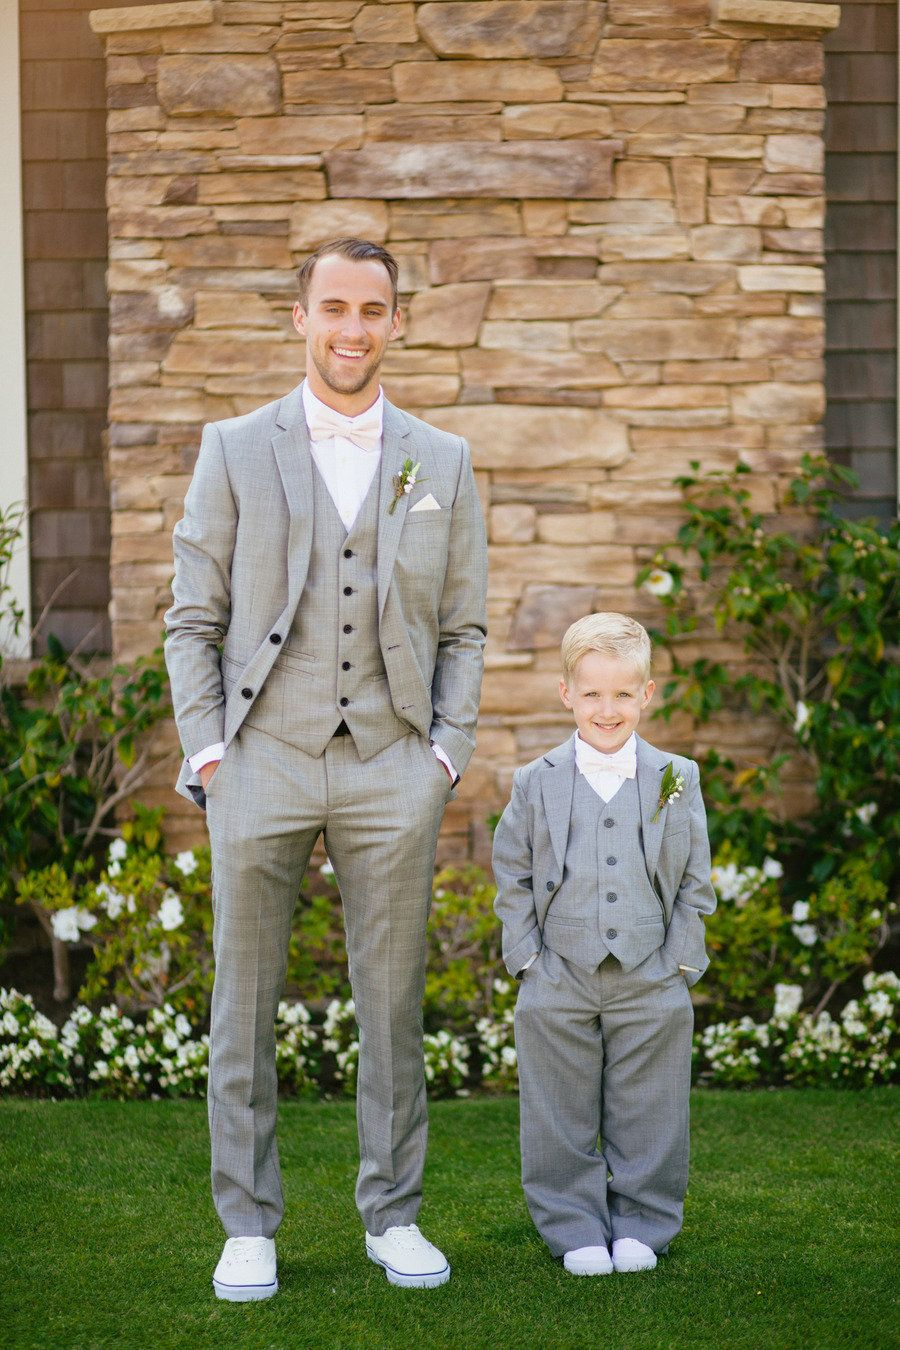 Laguna Beach Wedding From Sara And Rocky Photography Lafleur Dasi Bowtie Tie Knit Slim Best Man Self Bow Purple Flower Grey Suit Pink